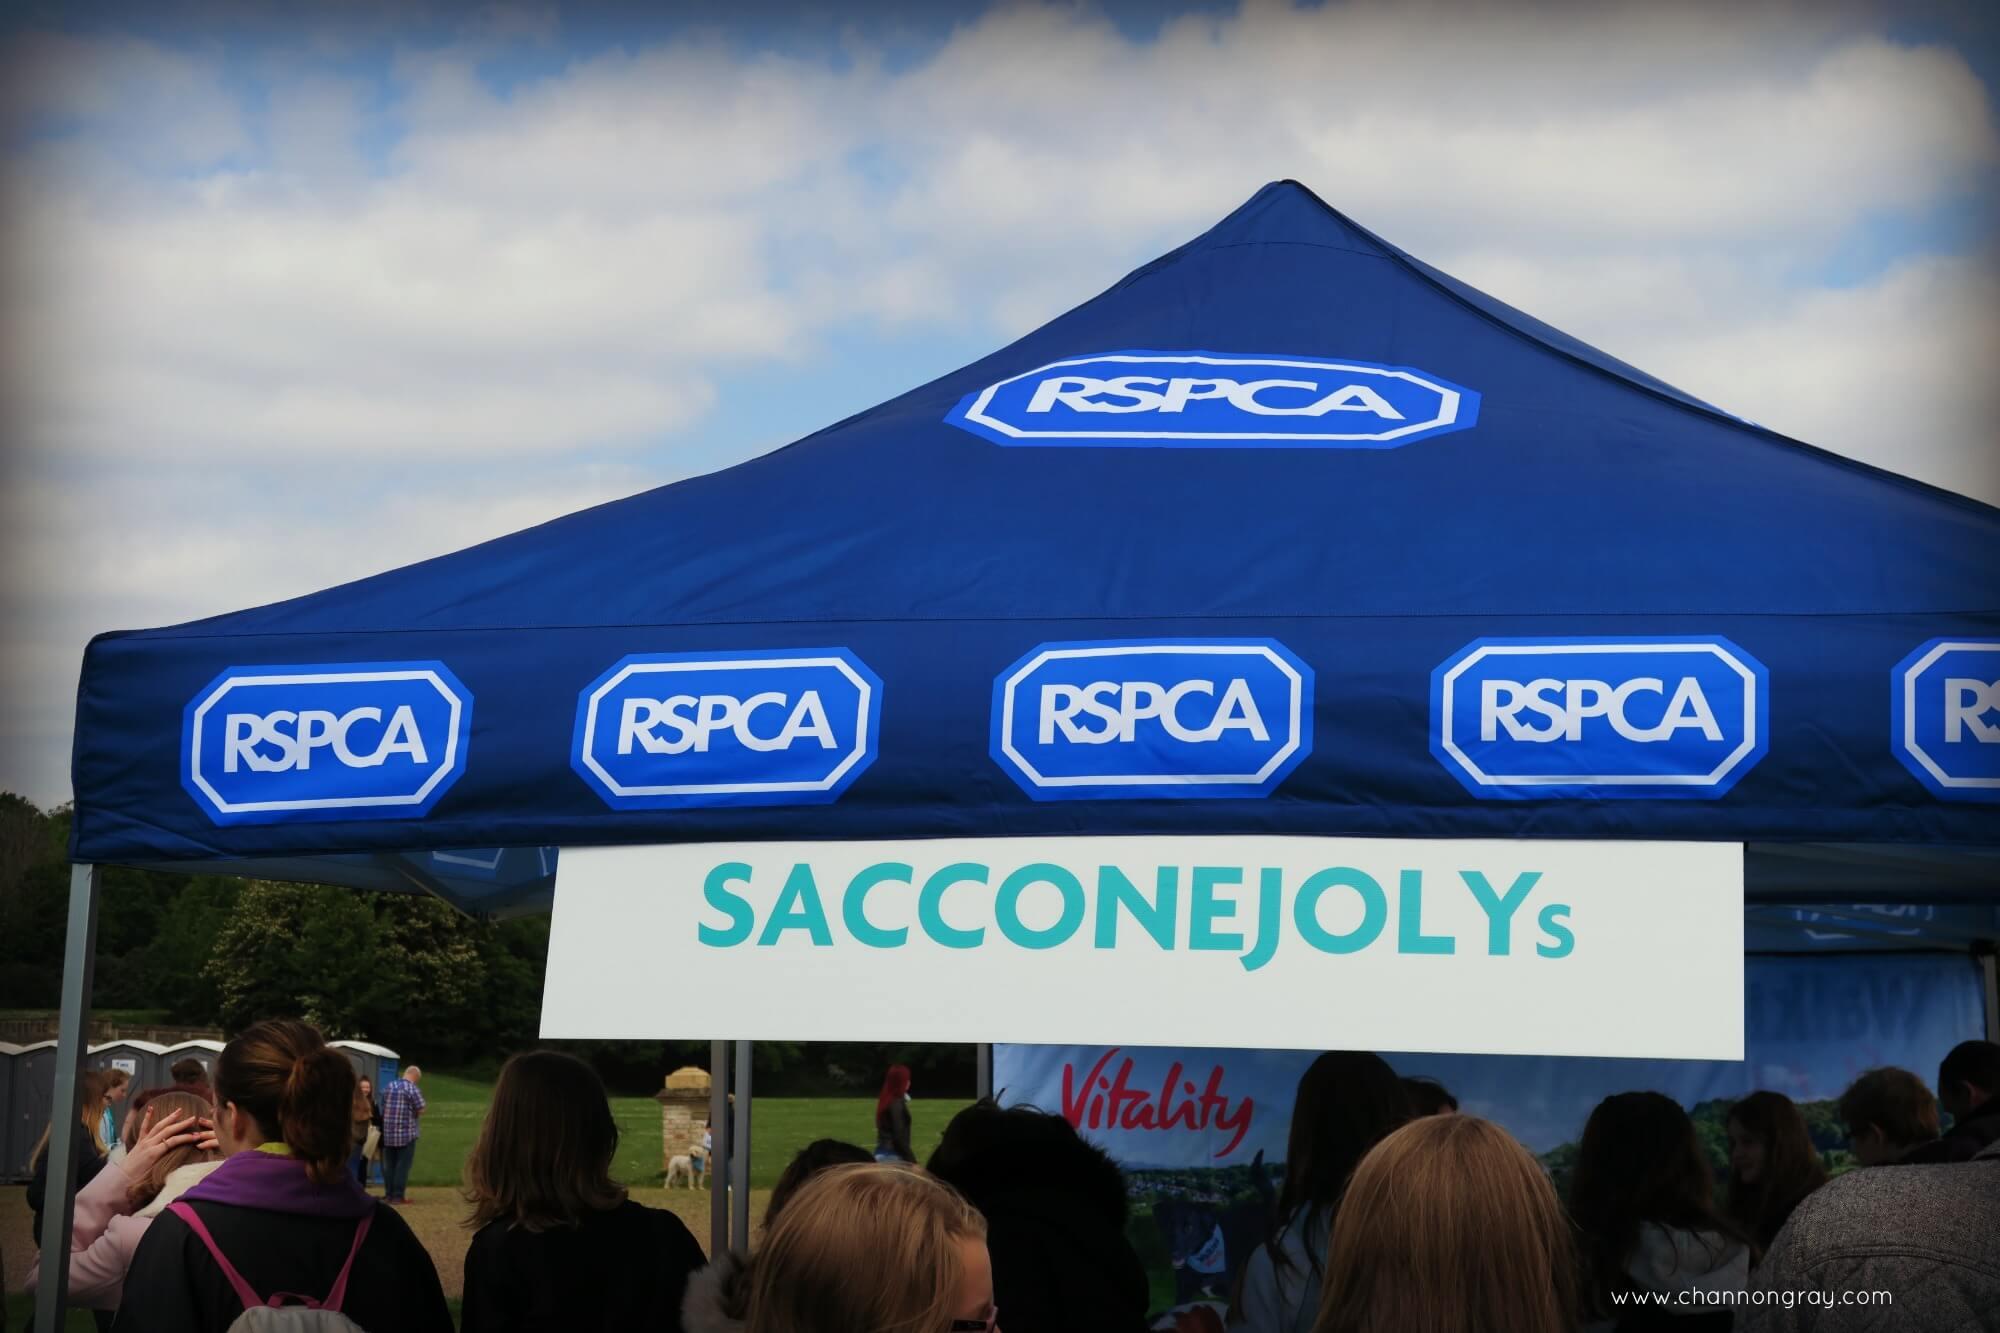 RSPCA Big Walkies and the SacconeJolys - London